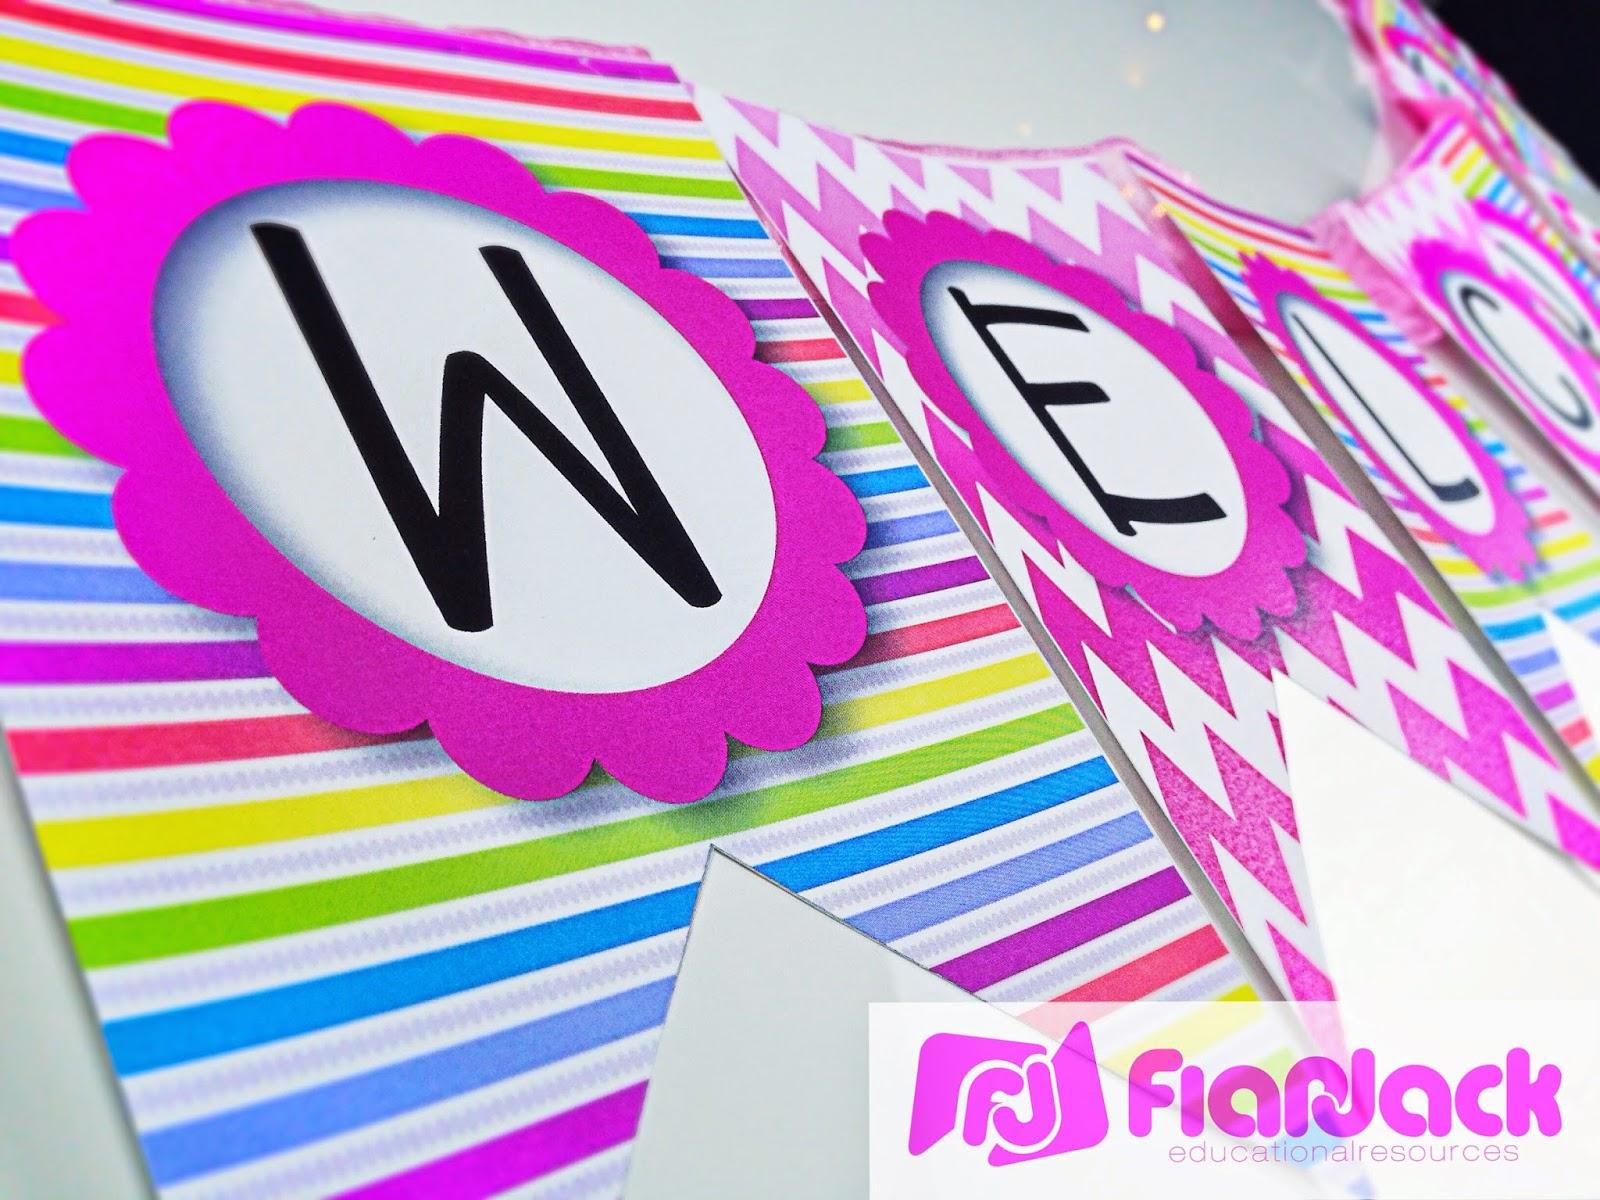 http://bilingualteacherclubhouse.blogspot.com/2014/07/bilingual-neon-welcome-banner-freebie.html